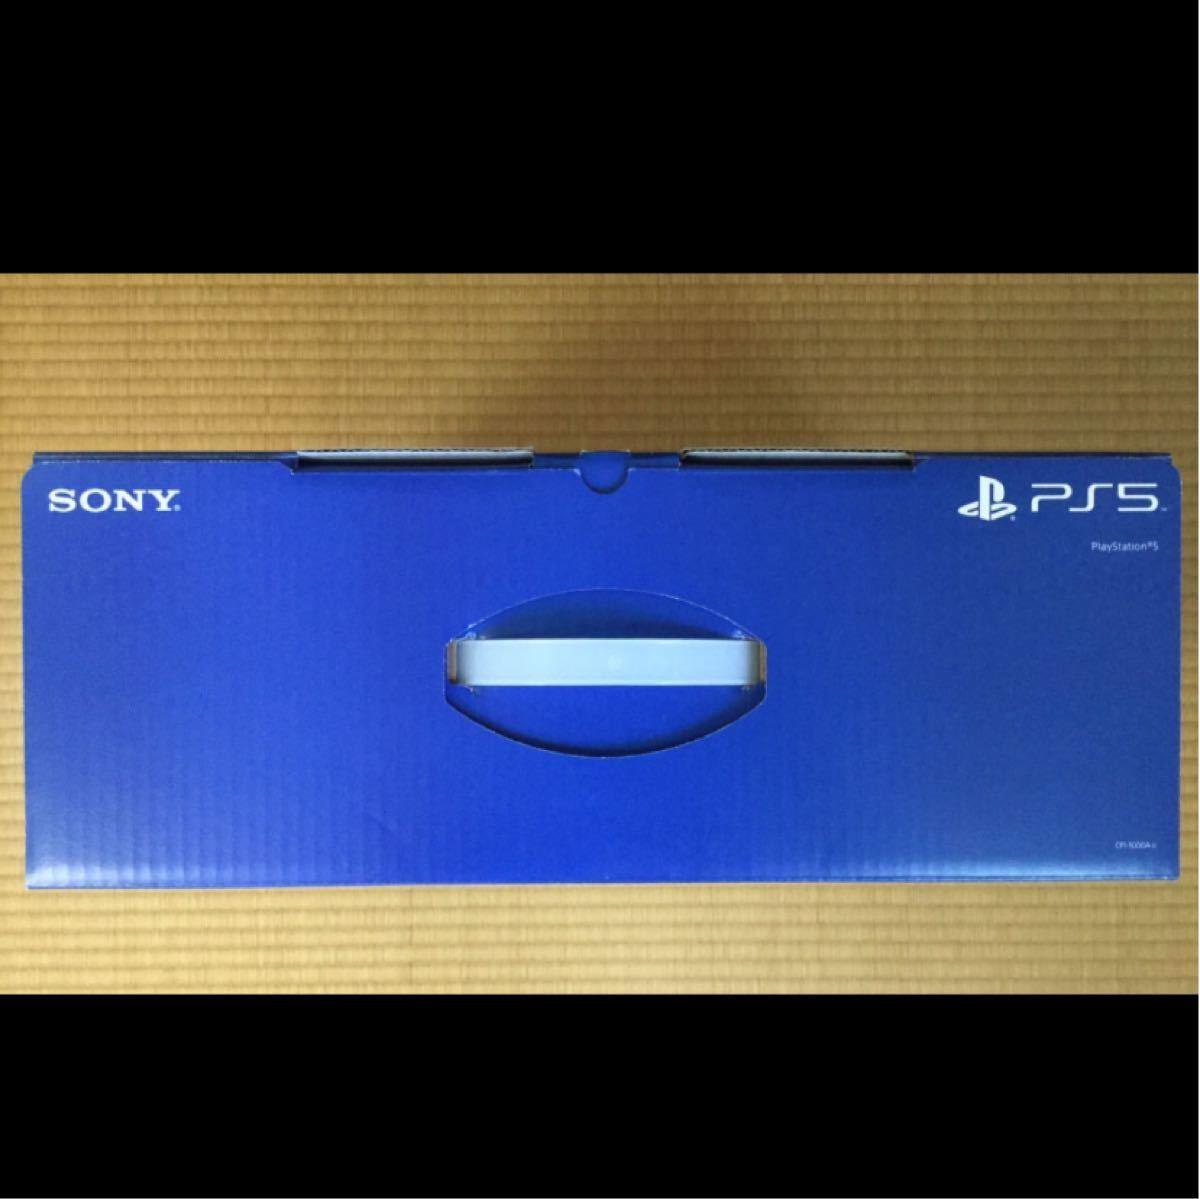 PlayStation 5(プレイステーション 5) ディスク有りタイプ